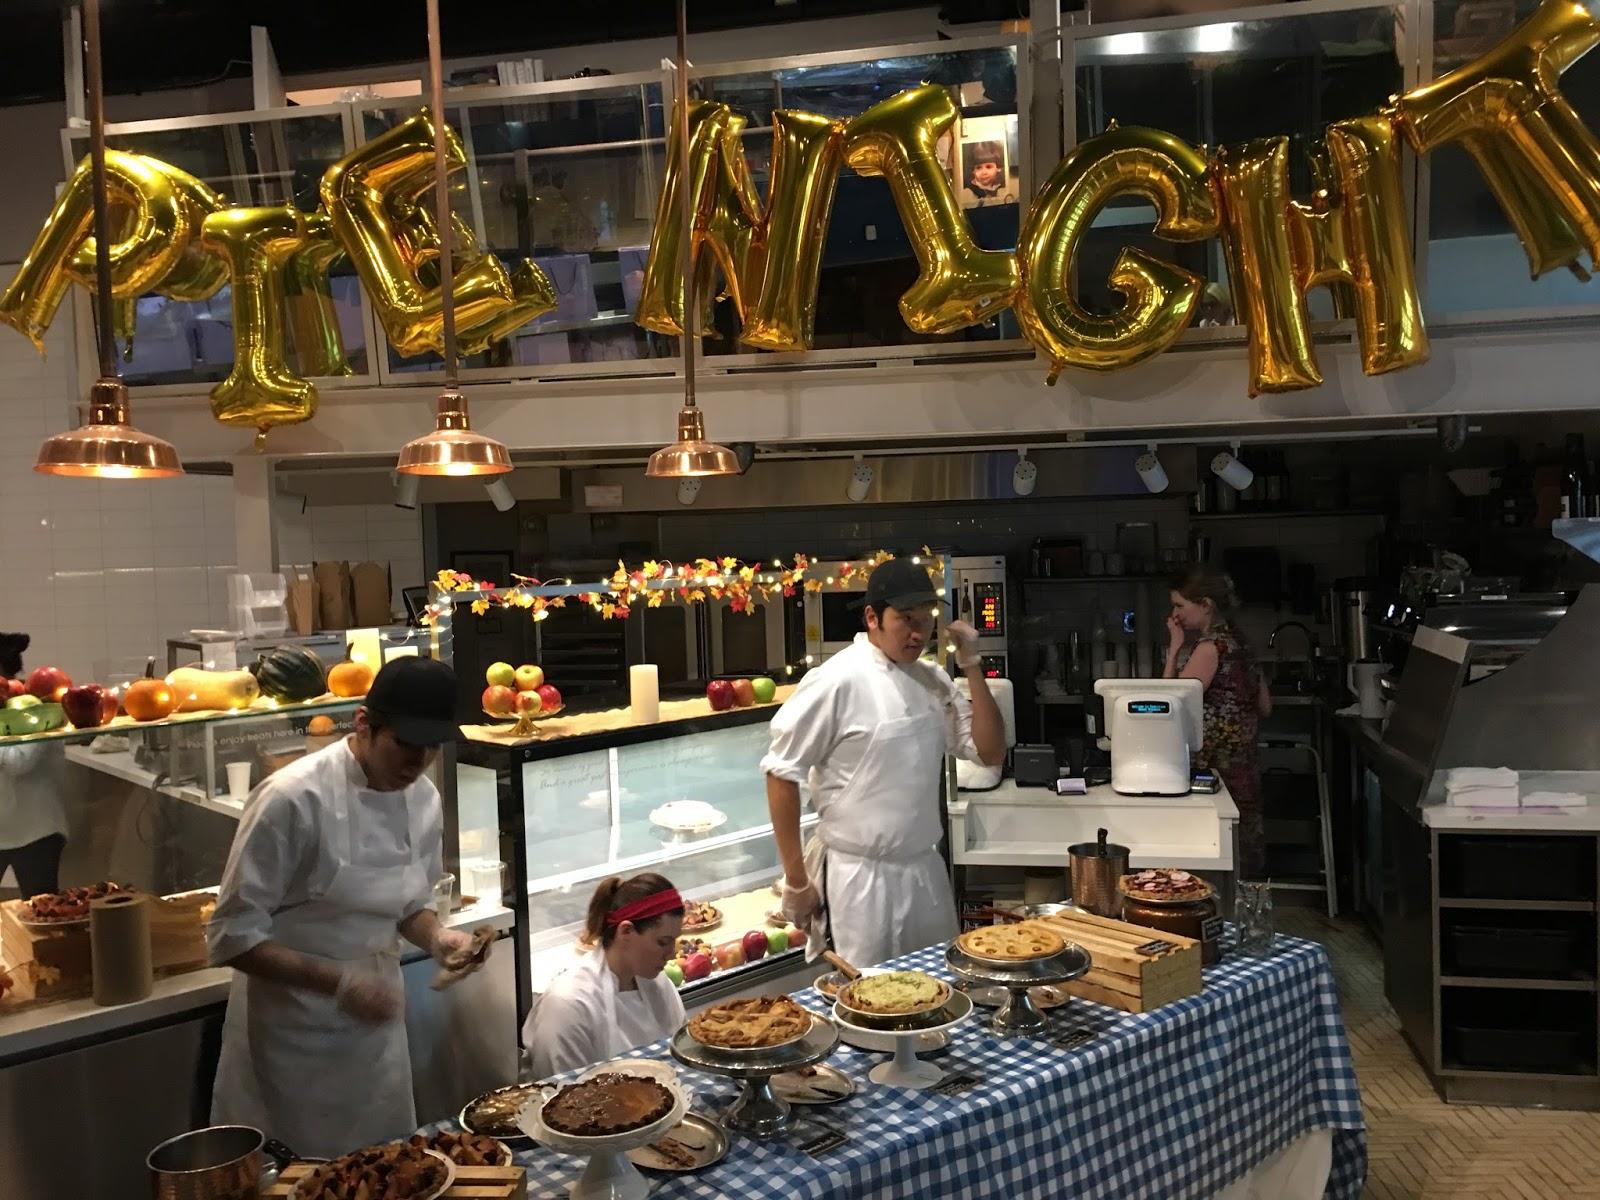 pie night at dominique ansel kitchen - Dominique Ansel Kitchen